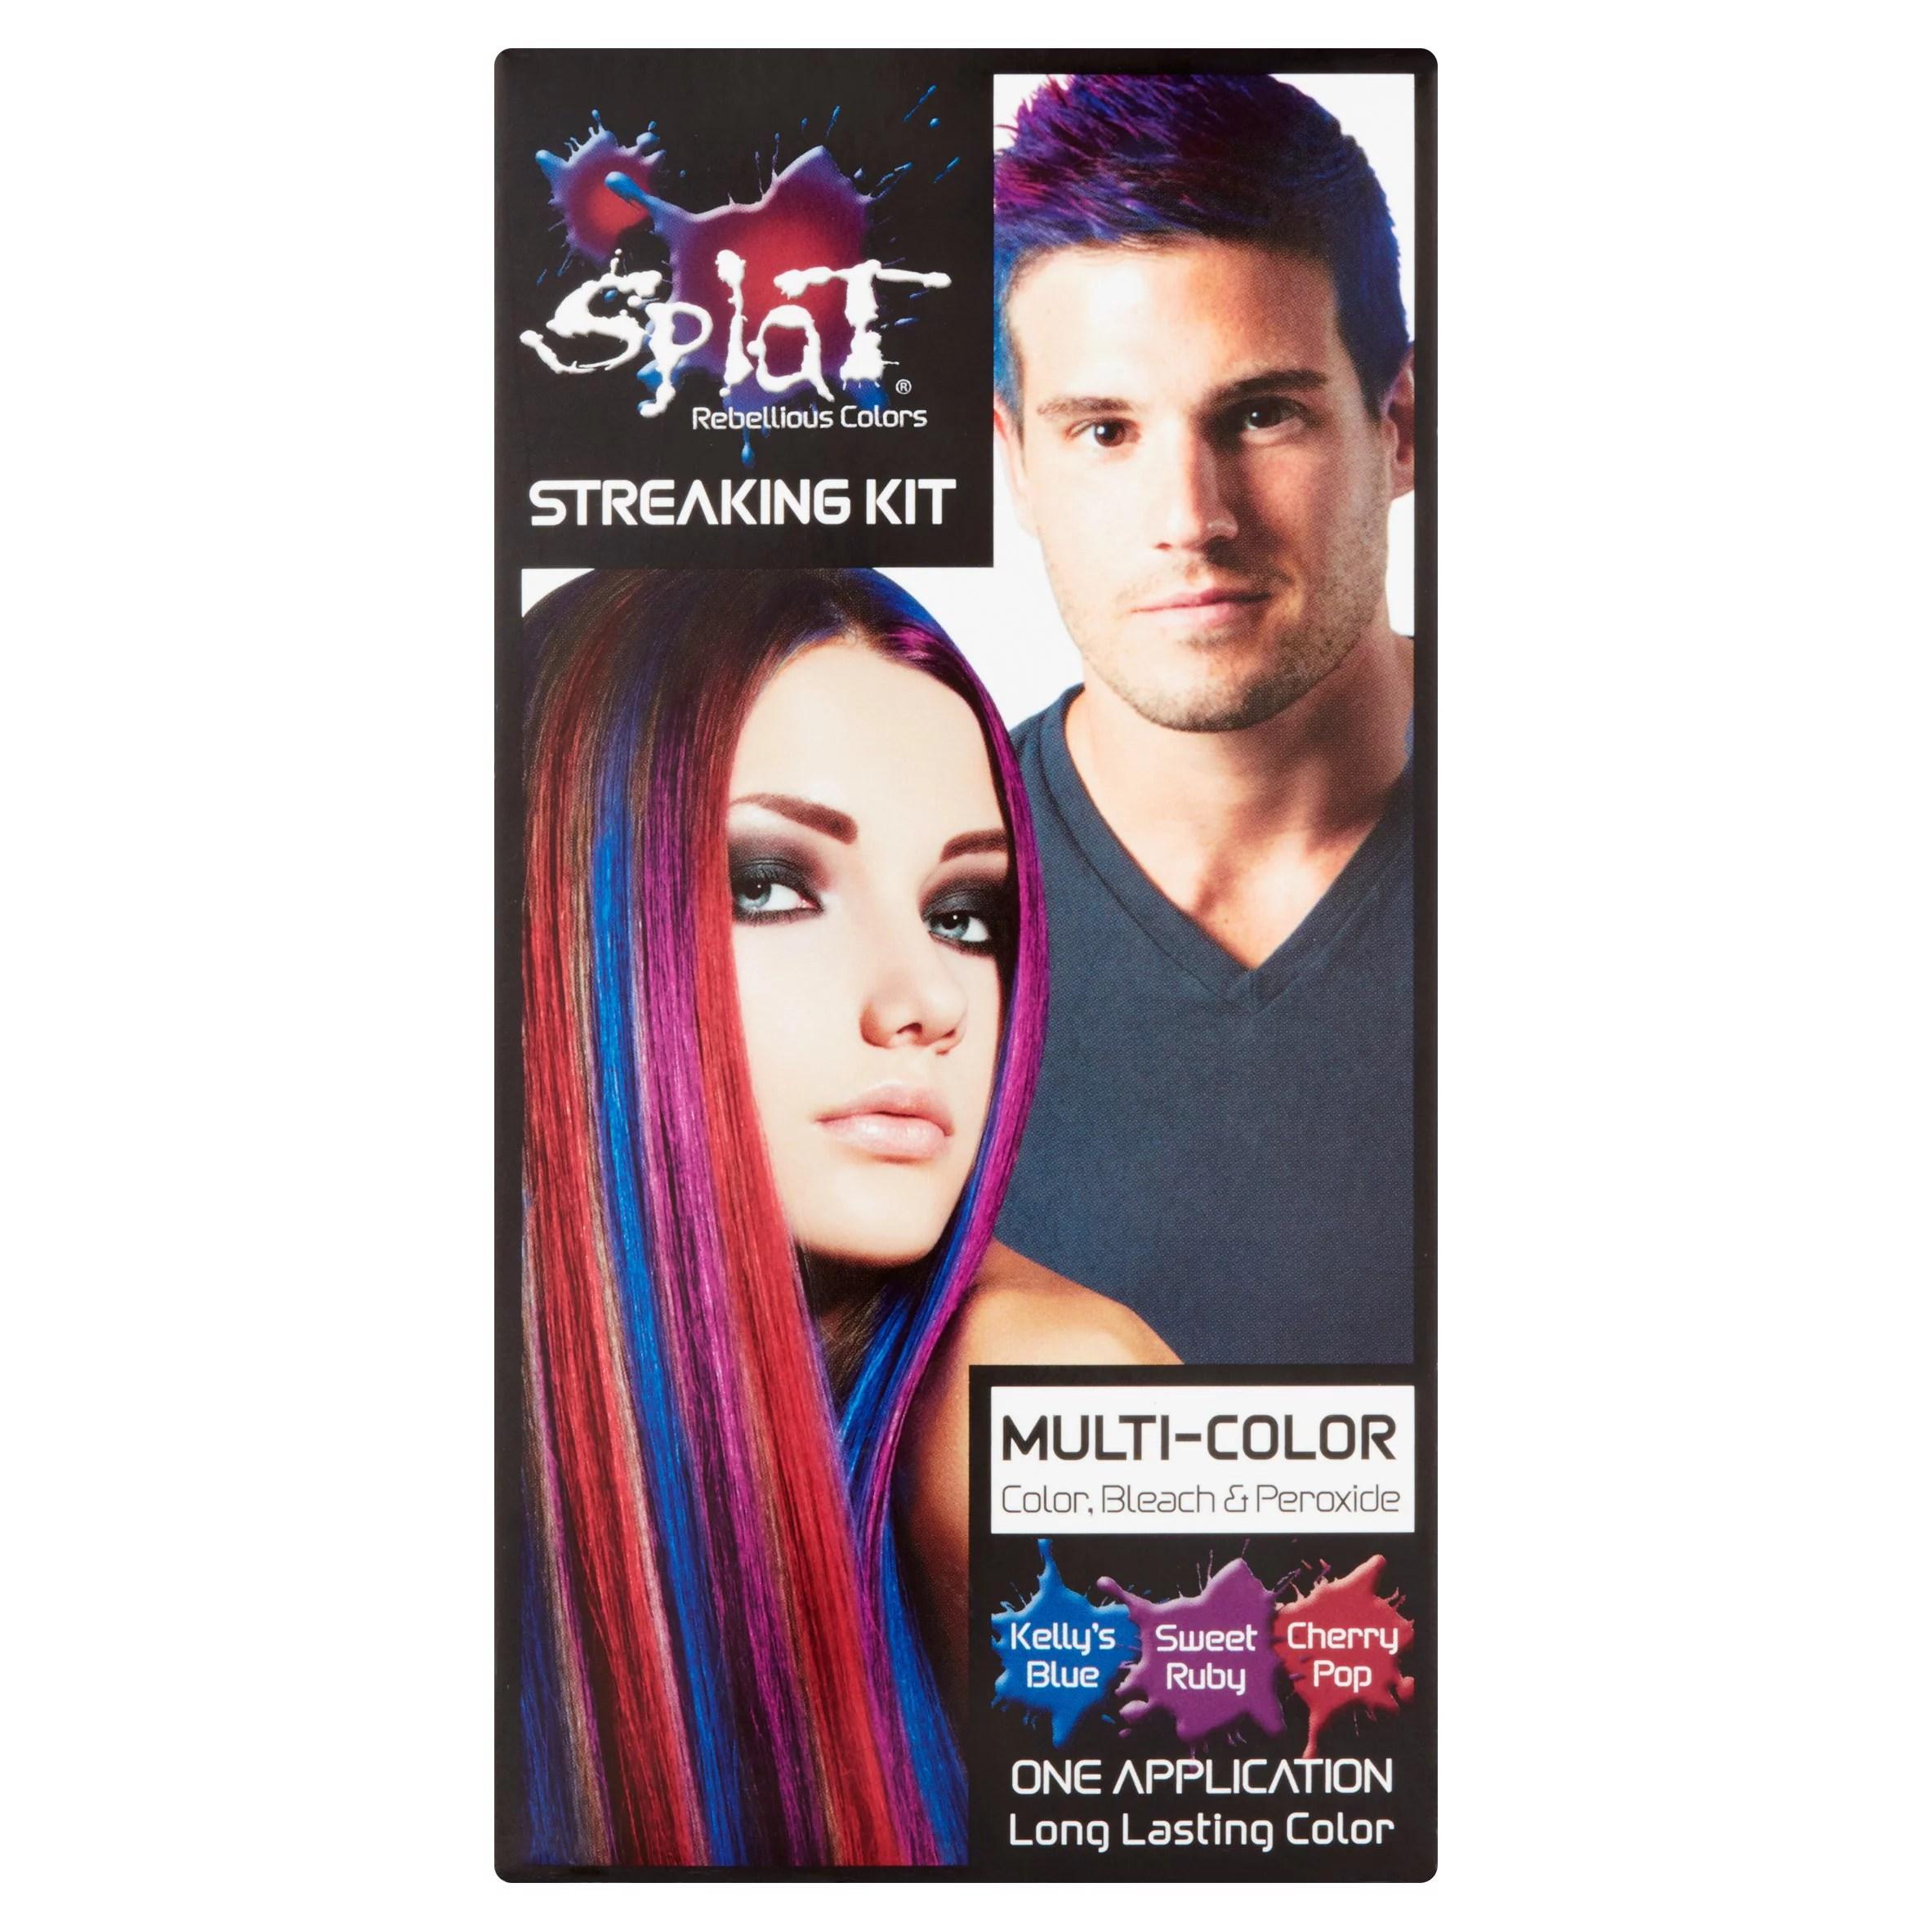 Splat Multi Color Hair Color Streaking Kit With Blue Ruby Red Hair Dye Walmart Com Walmart Com